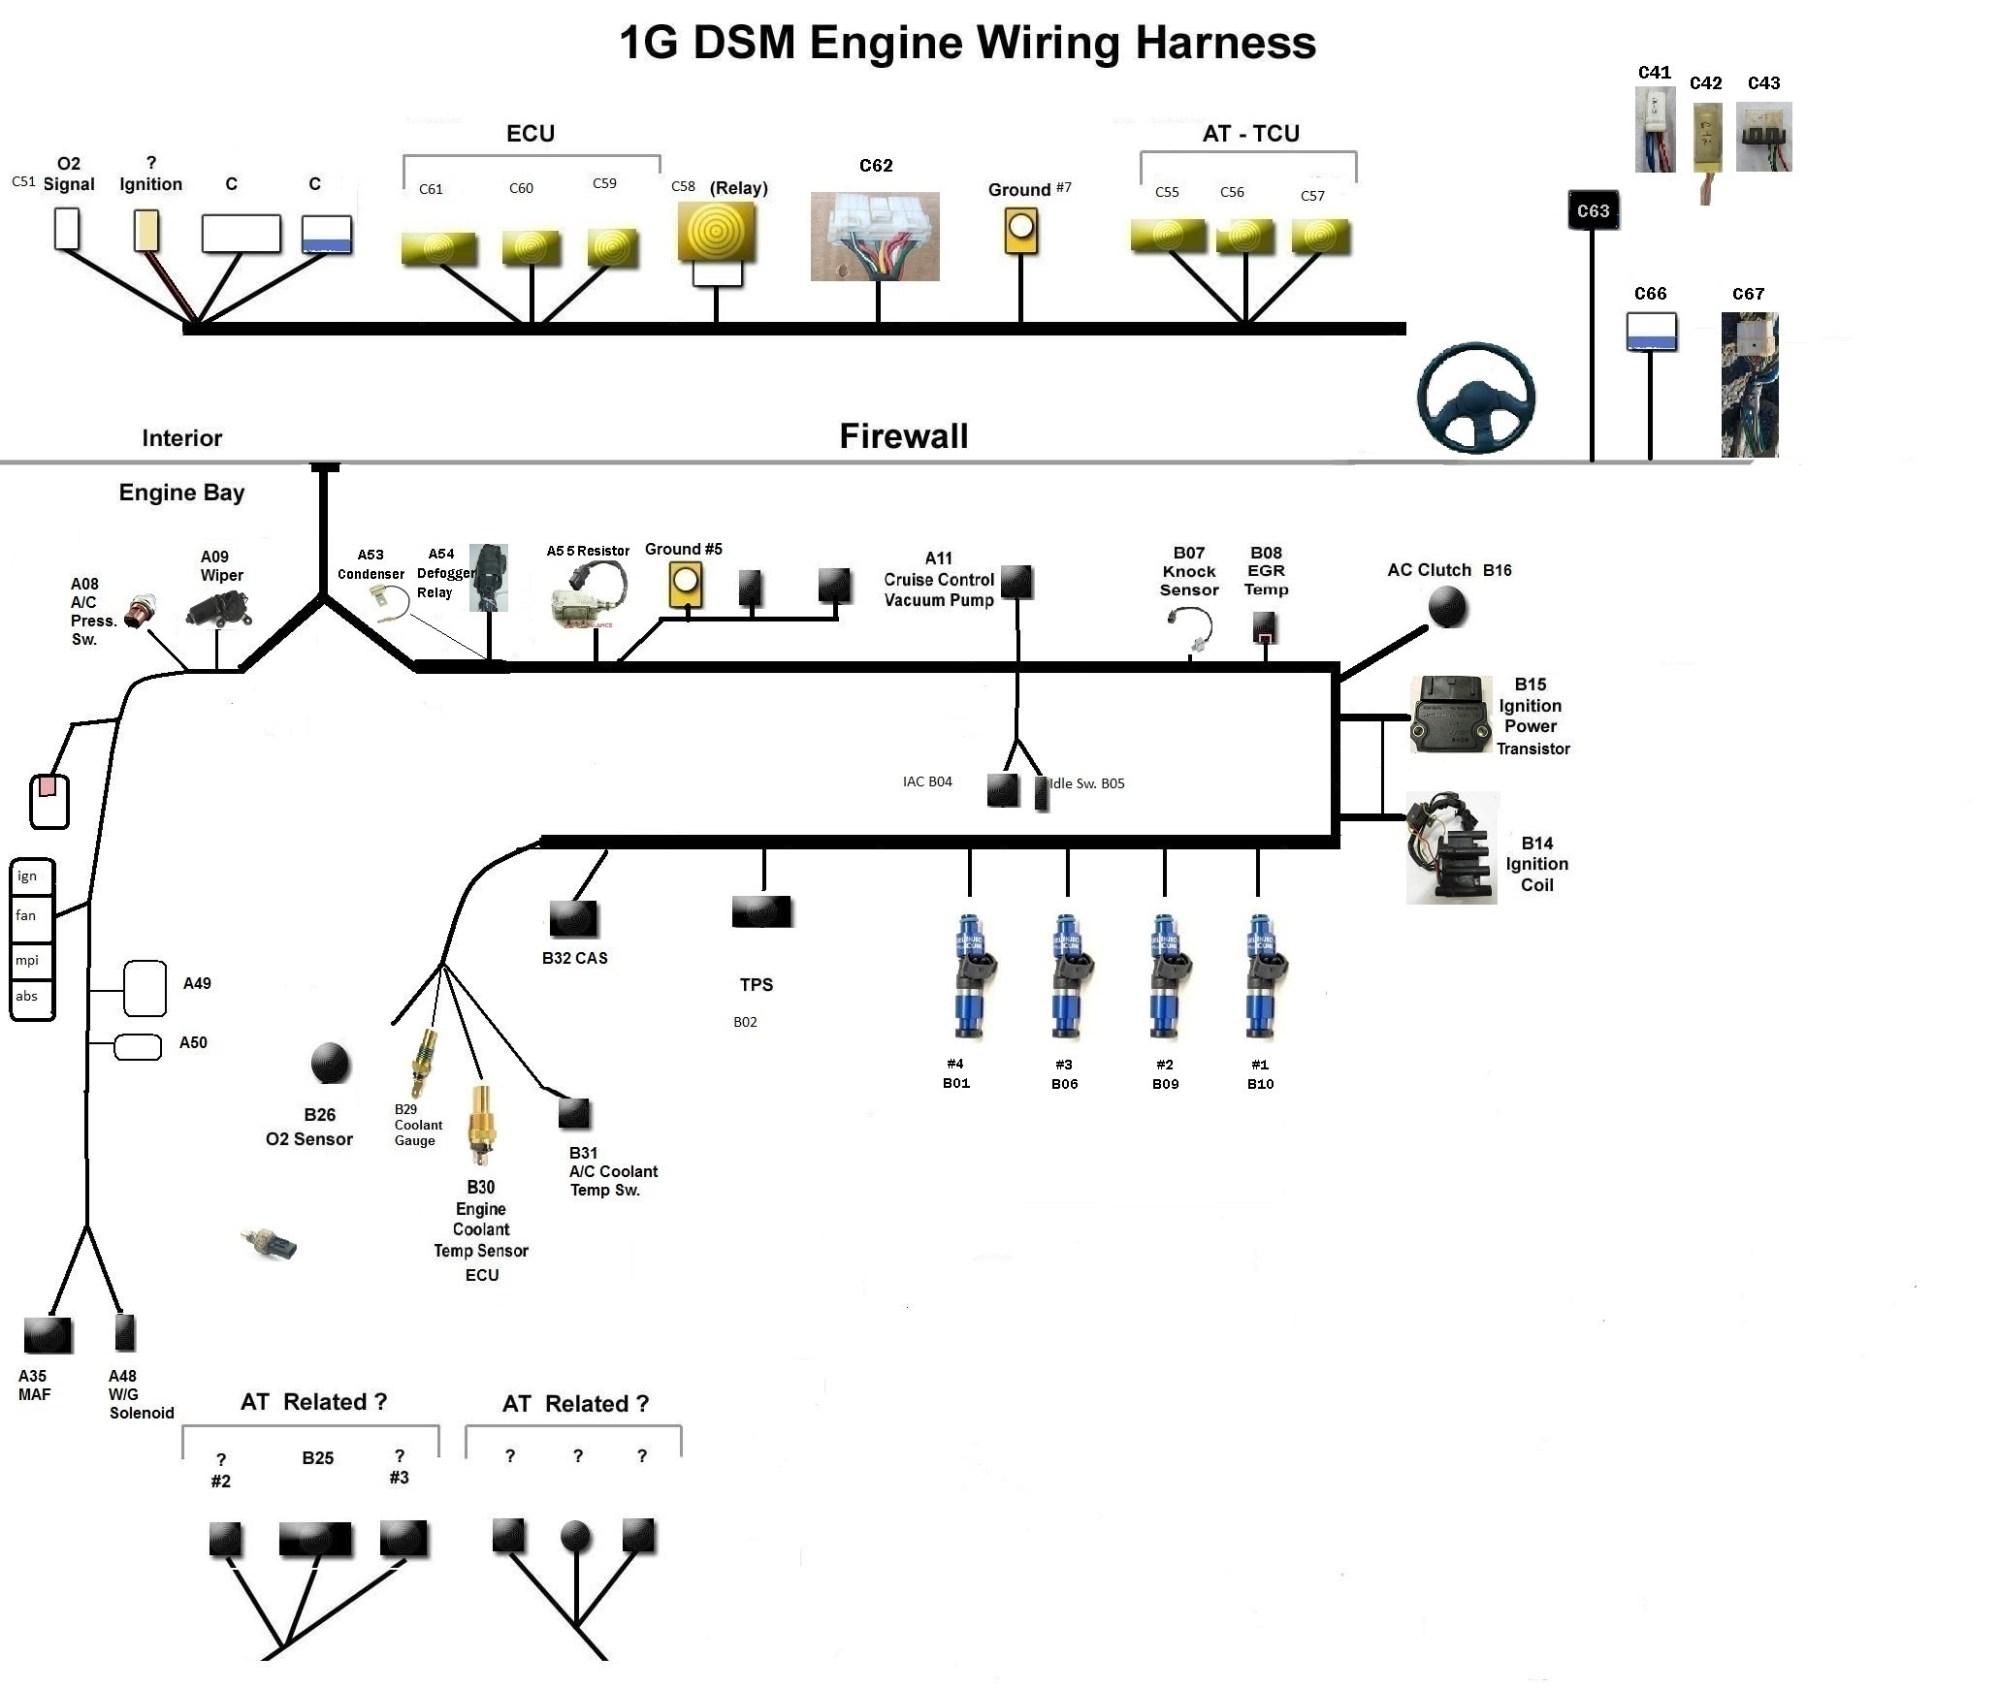 hight resolution of 1gb dsm 4g63 turbo wiring harness diagram 1gb dsm 4g63 turbo wiring harness 1991 94